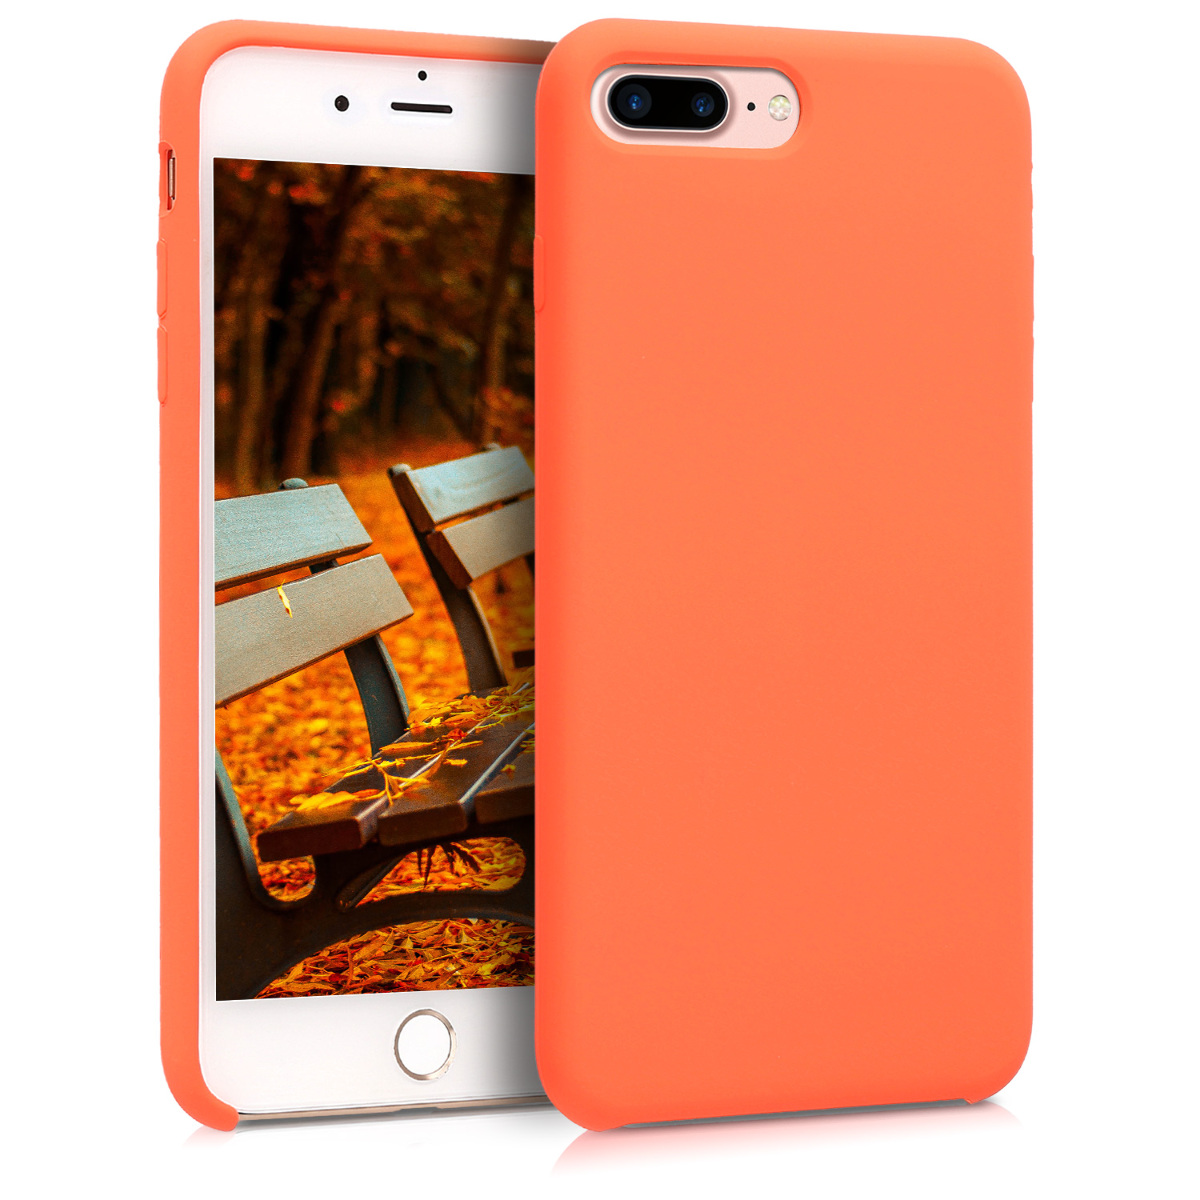 KW TPU Θήκη Σιλικόνης Apple iPhone 7 Plus / 8 Plus - Soft Flexible Rubber Protective Cover - Orange (40842.29)